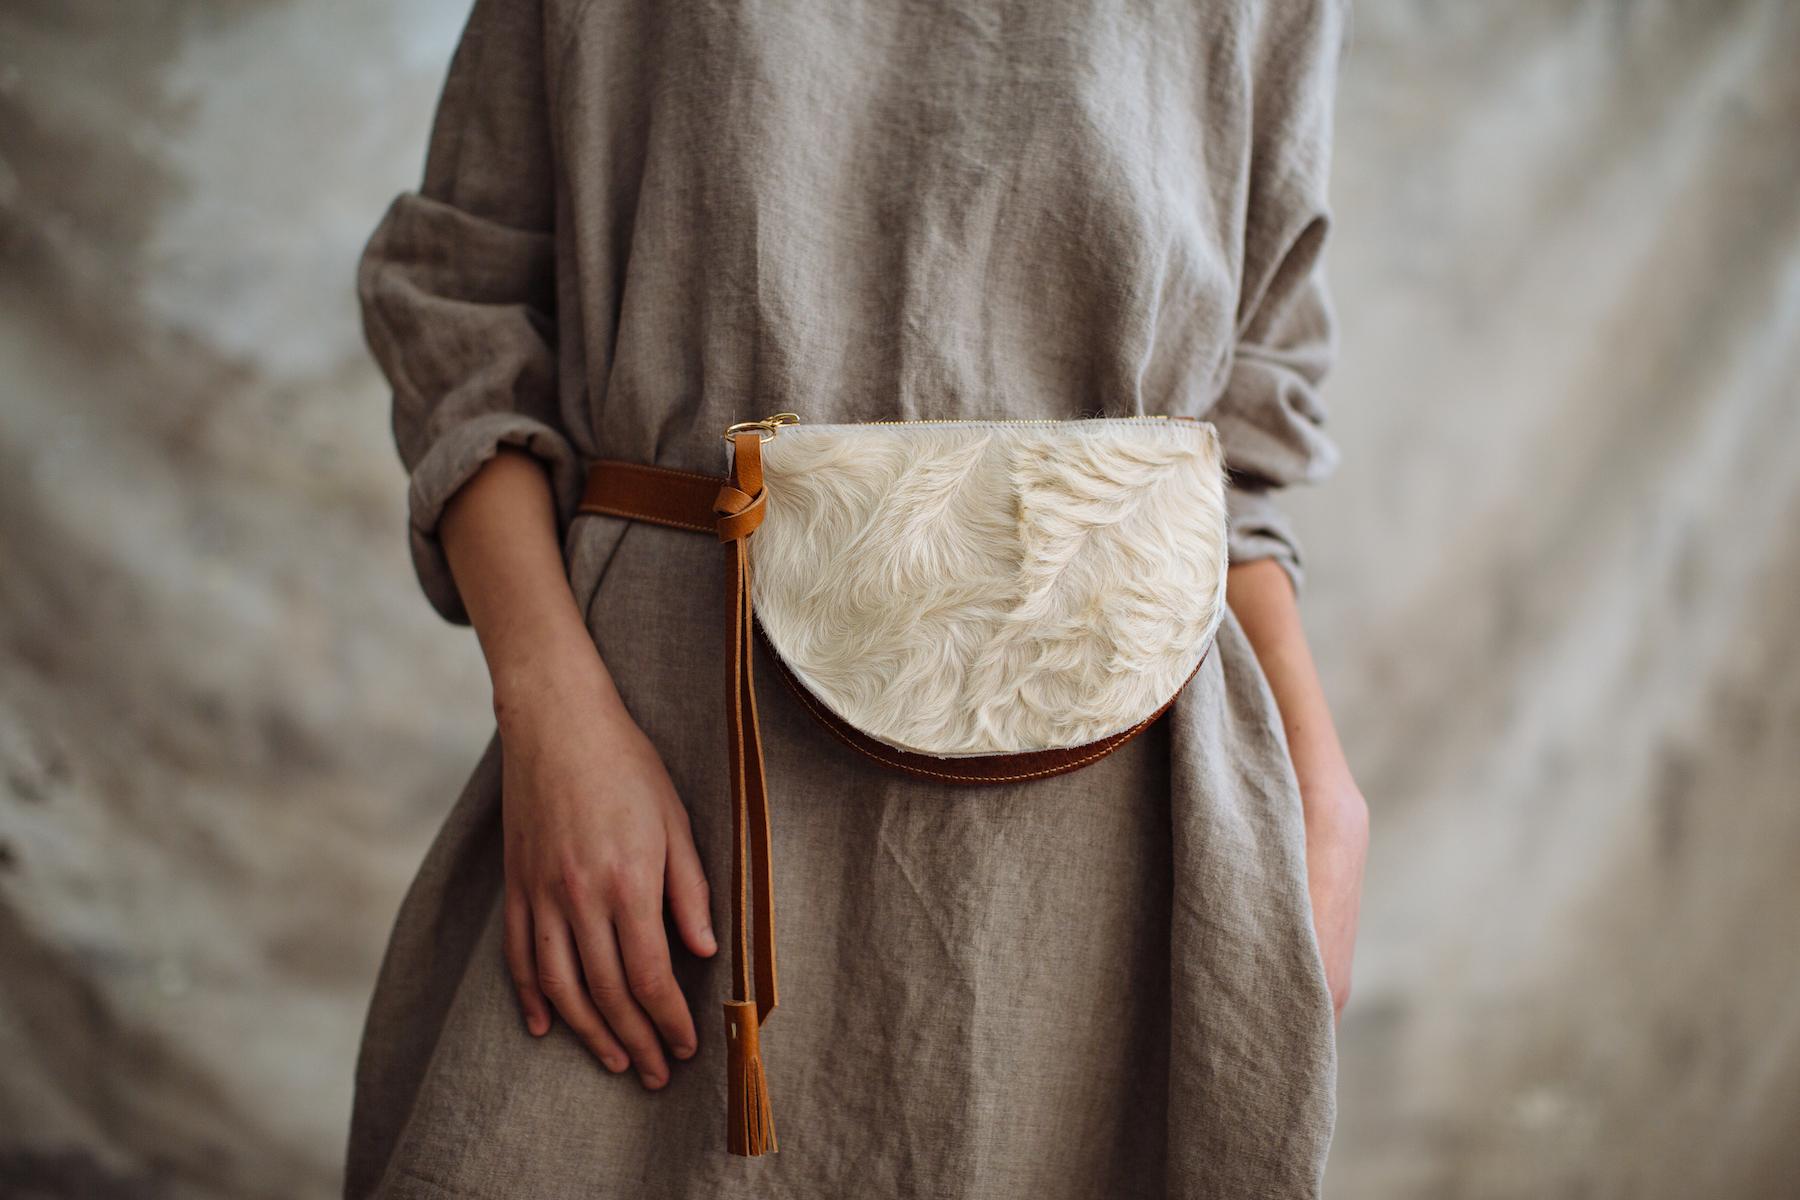 Pennyroyal Bum Bag in soft blonde hair-on cow hide